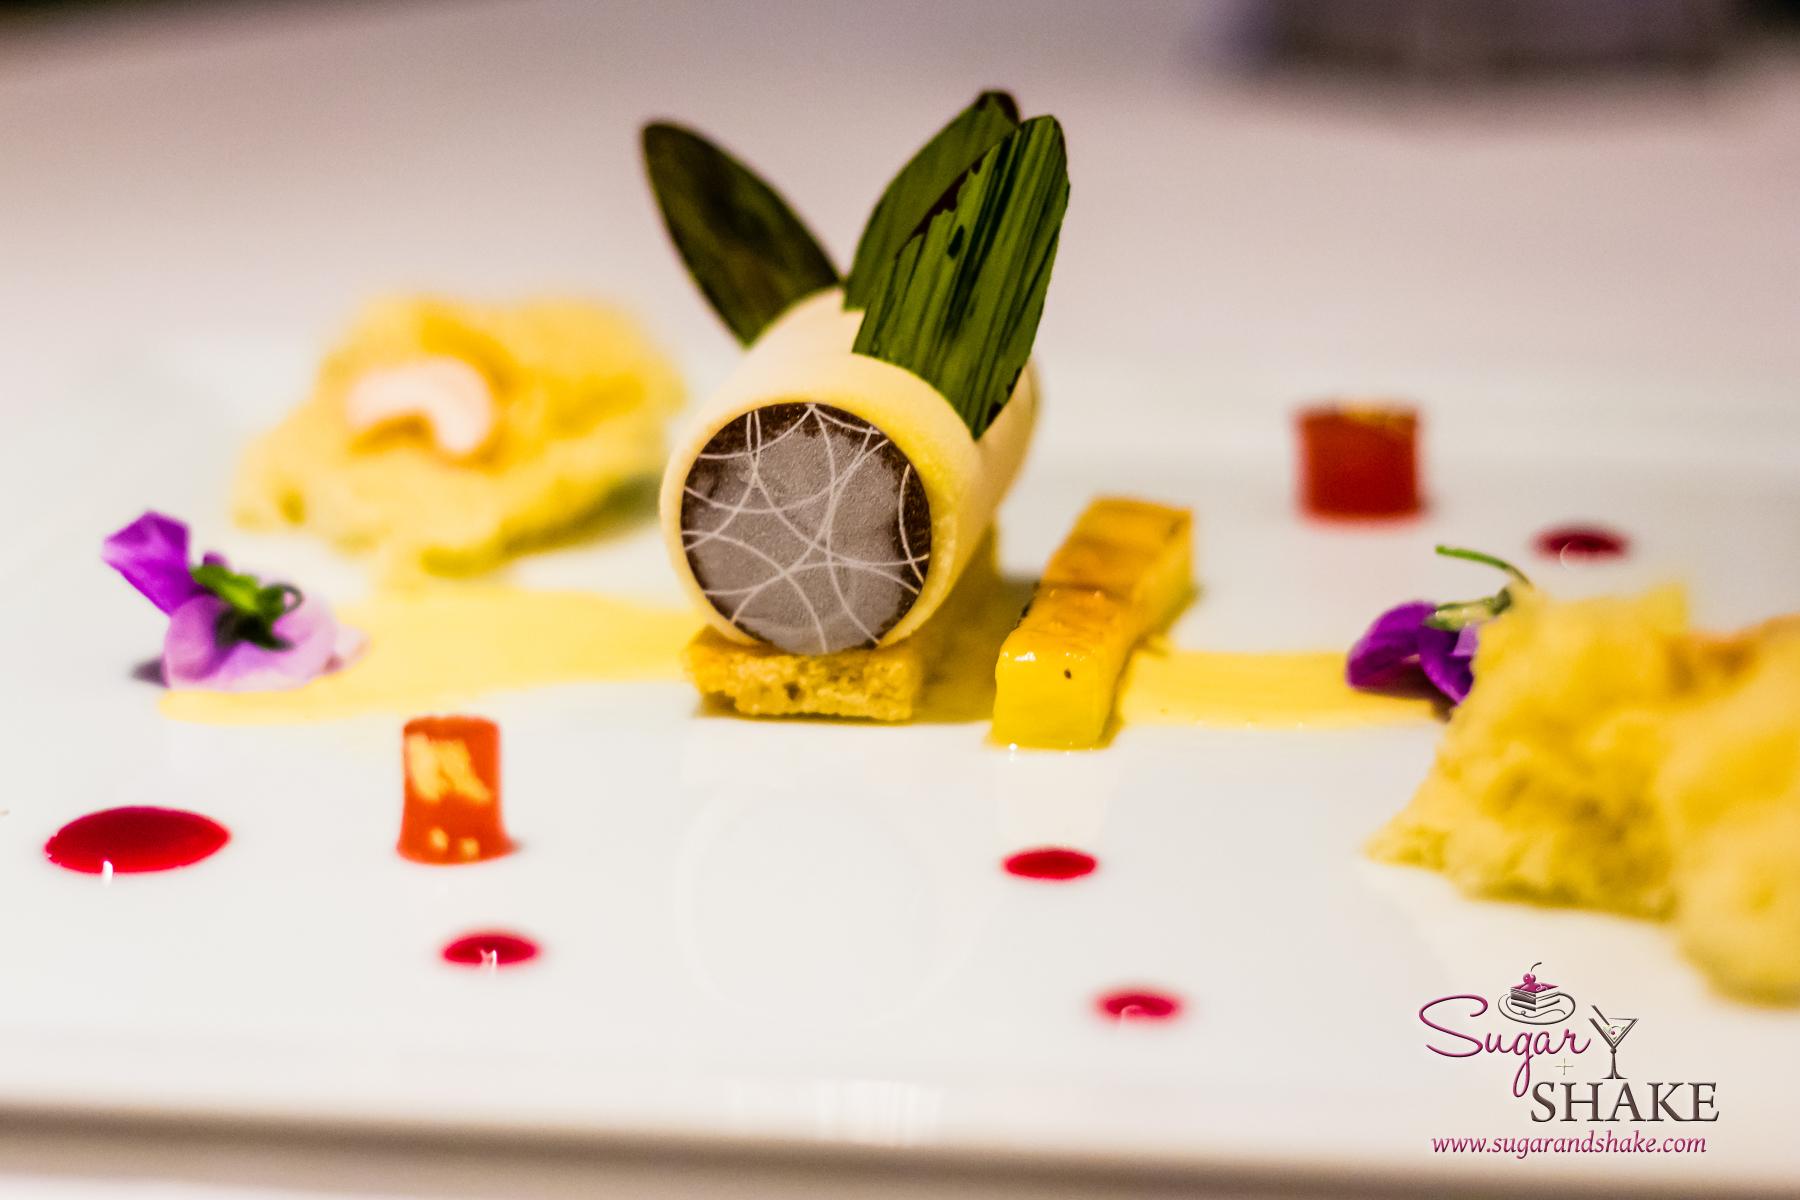 Orchids at the Halekulani. Dessert Course: Kulfi with Cashew Sponge Cake, Guava Gelée, Pomegranate and Pineapple Coulis. © 2013 Sugar + Shake